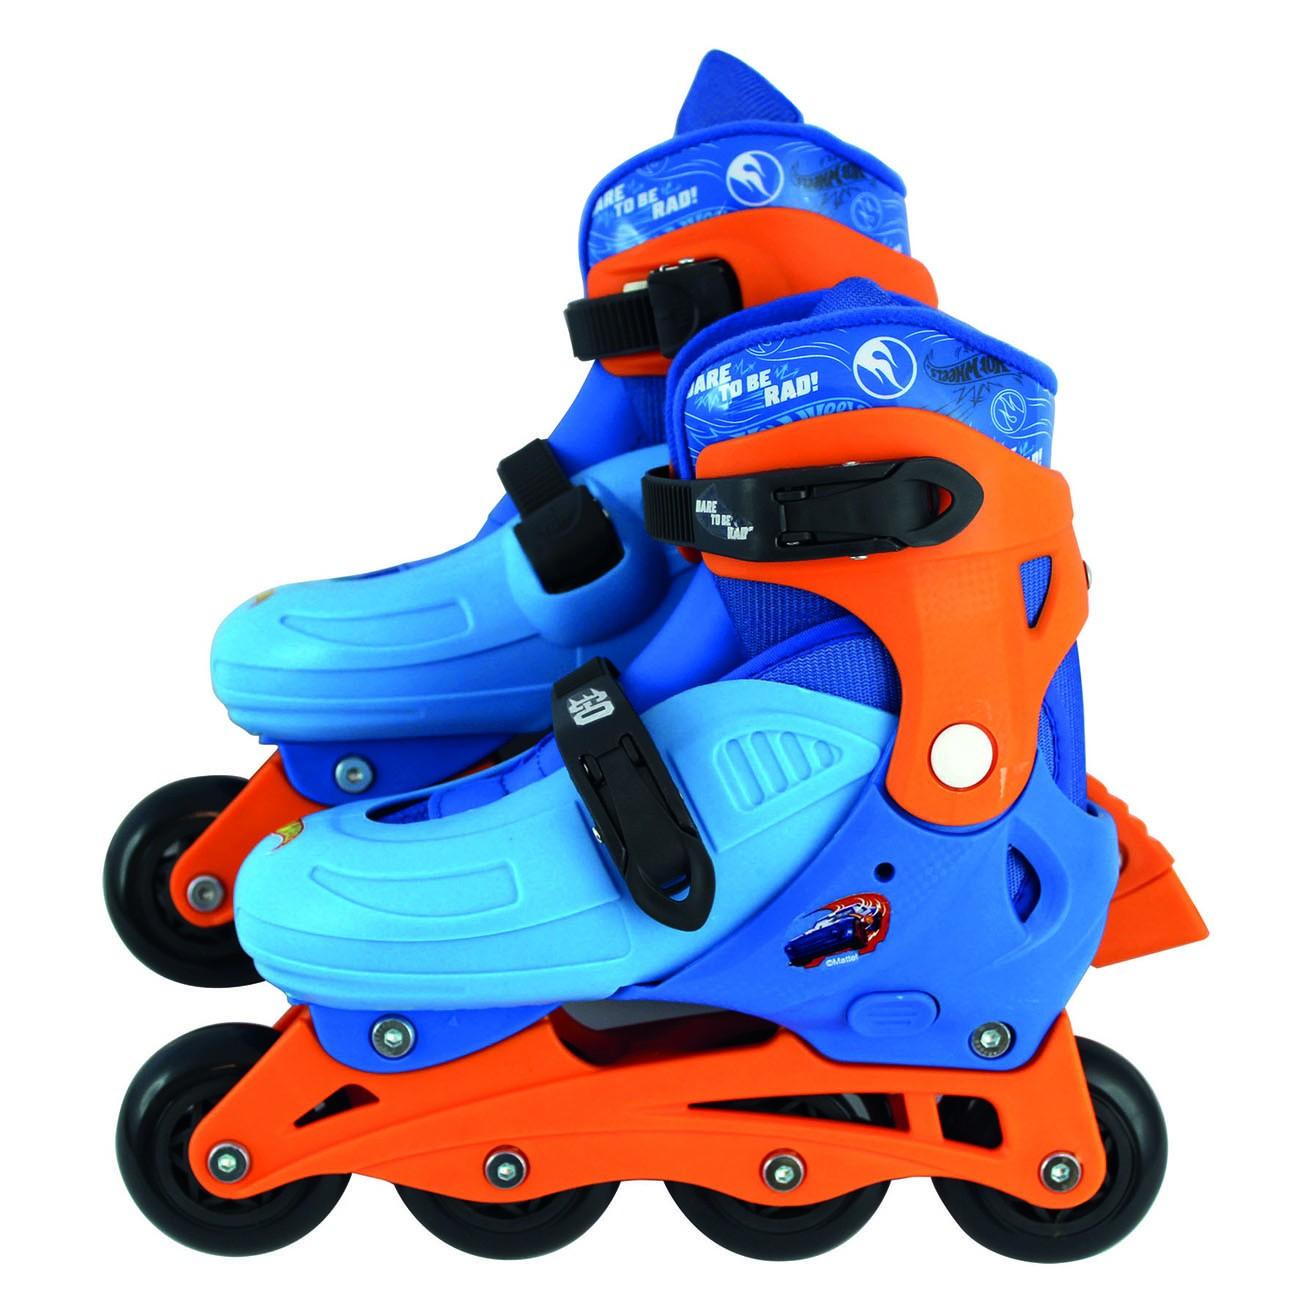 Hot Wheels Rollschuhe - Größe M